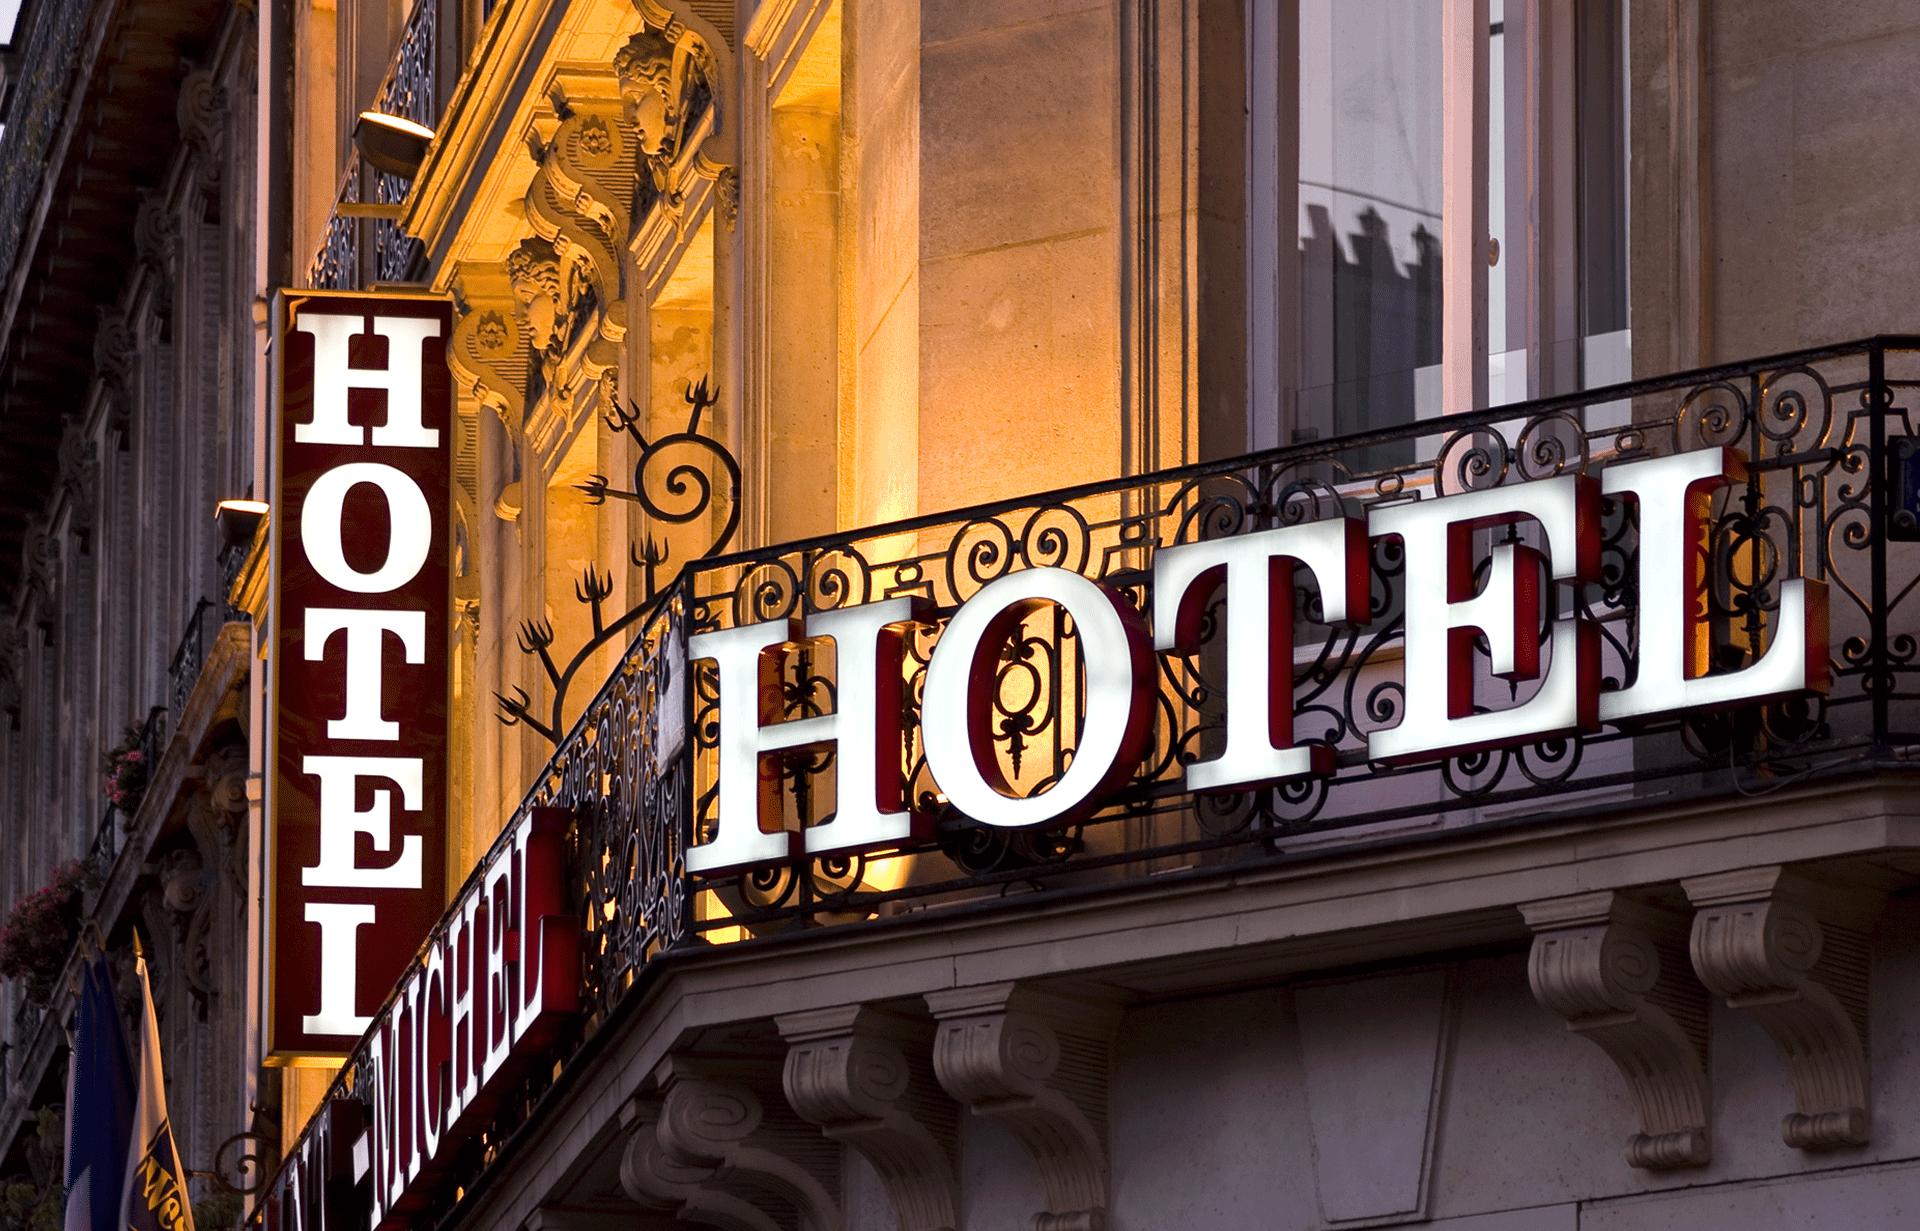 Flüge / Hotels